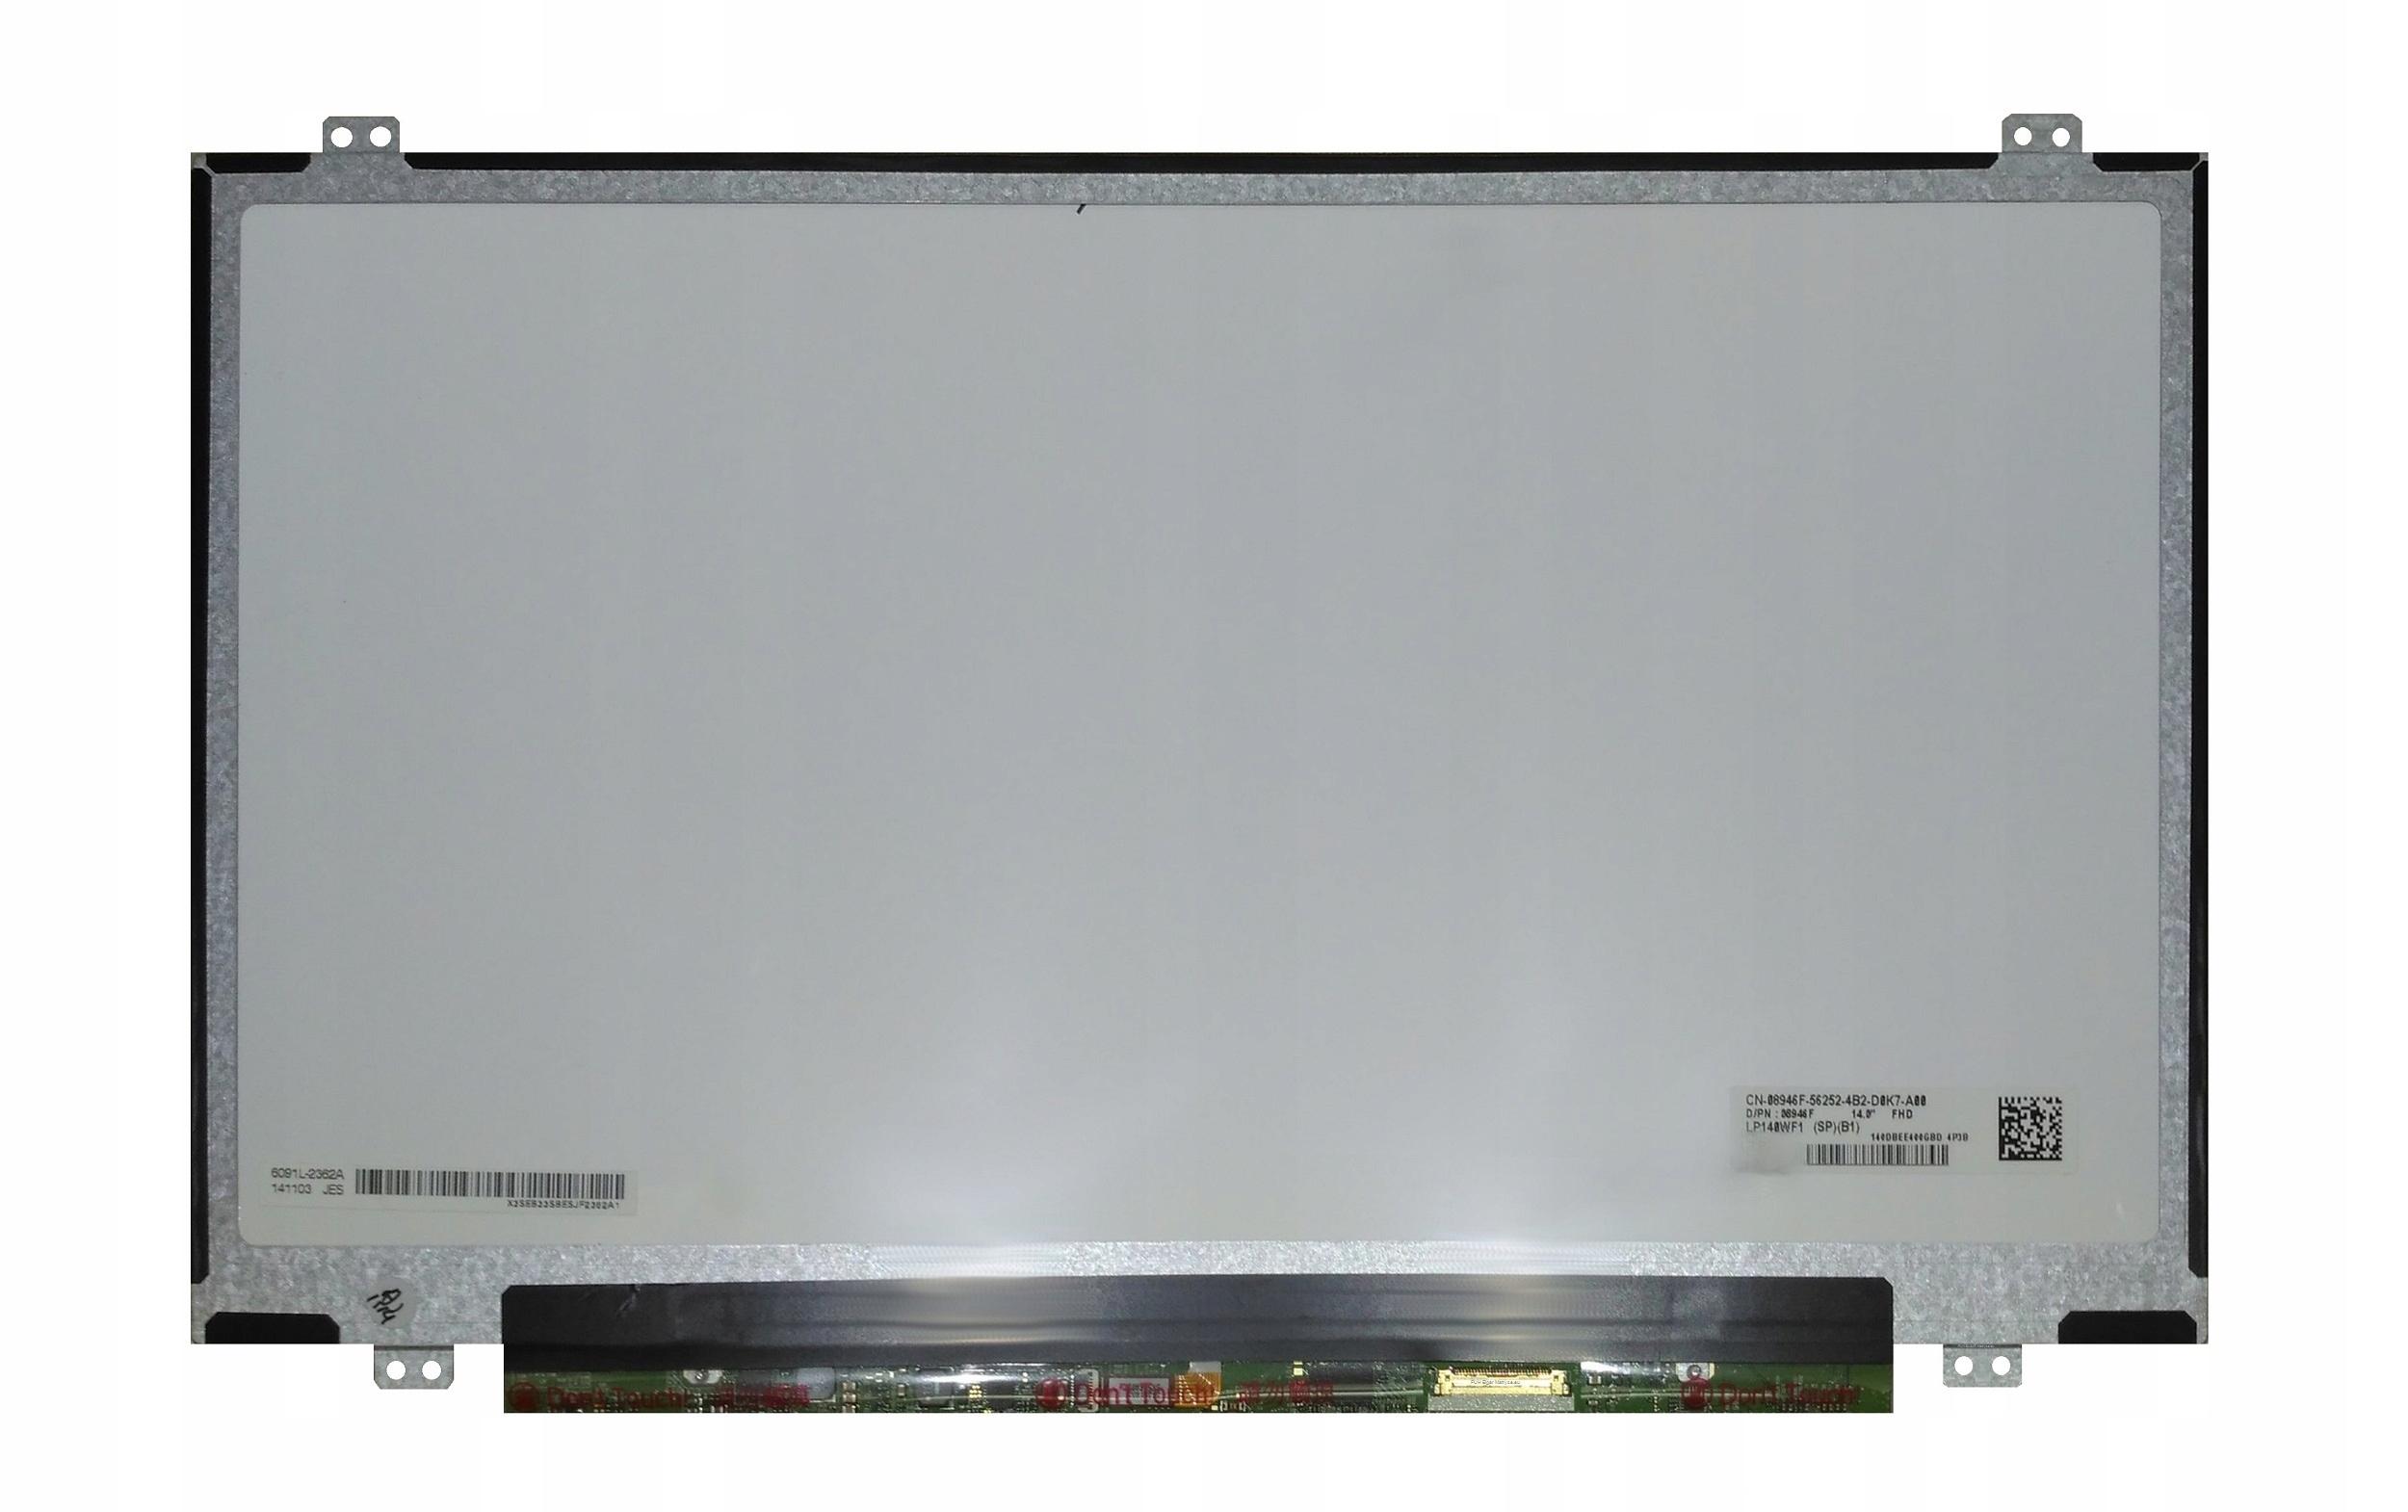 Matryca do Laptopa NoteBook HP ProBook 440 G3 IPS